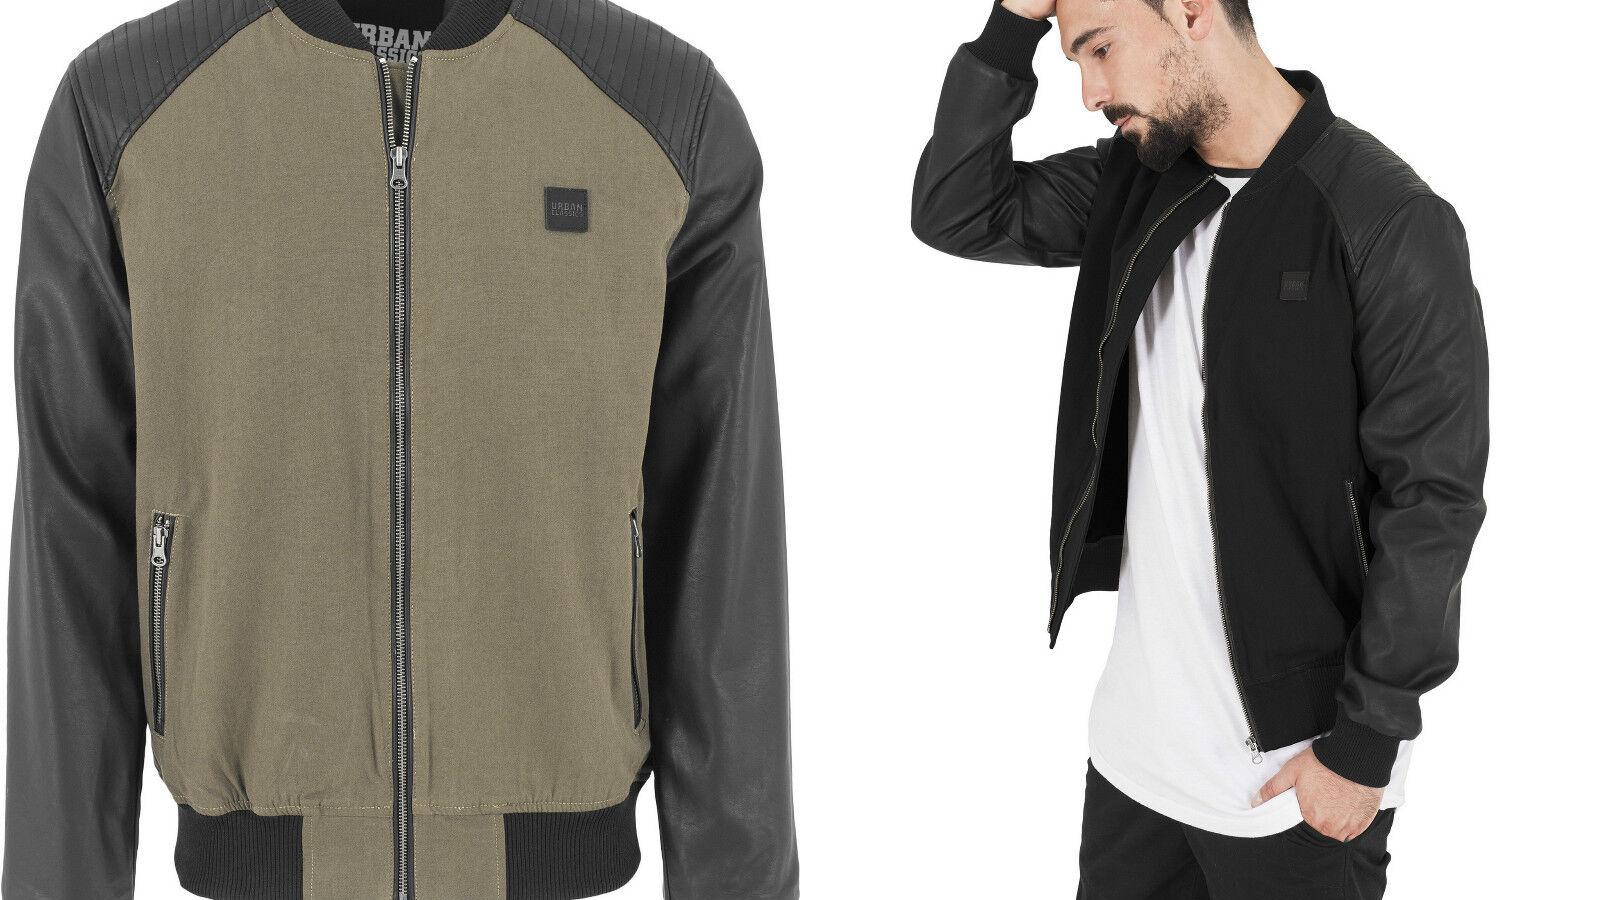 Städtisch Classics Jacke Herren Cotton Bomberjacke Leather Nachahmung TB1163